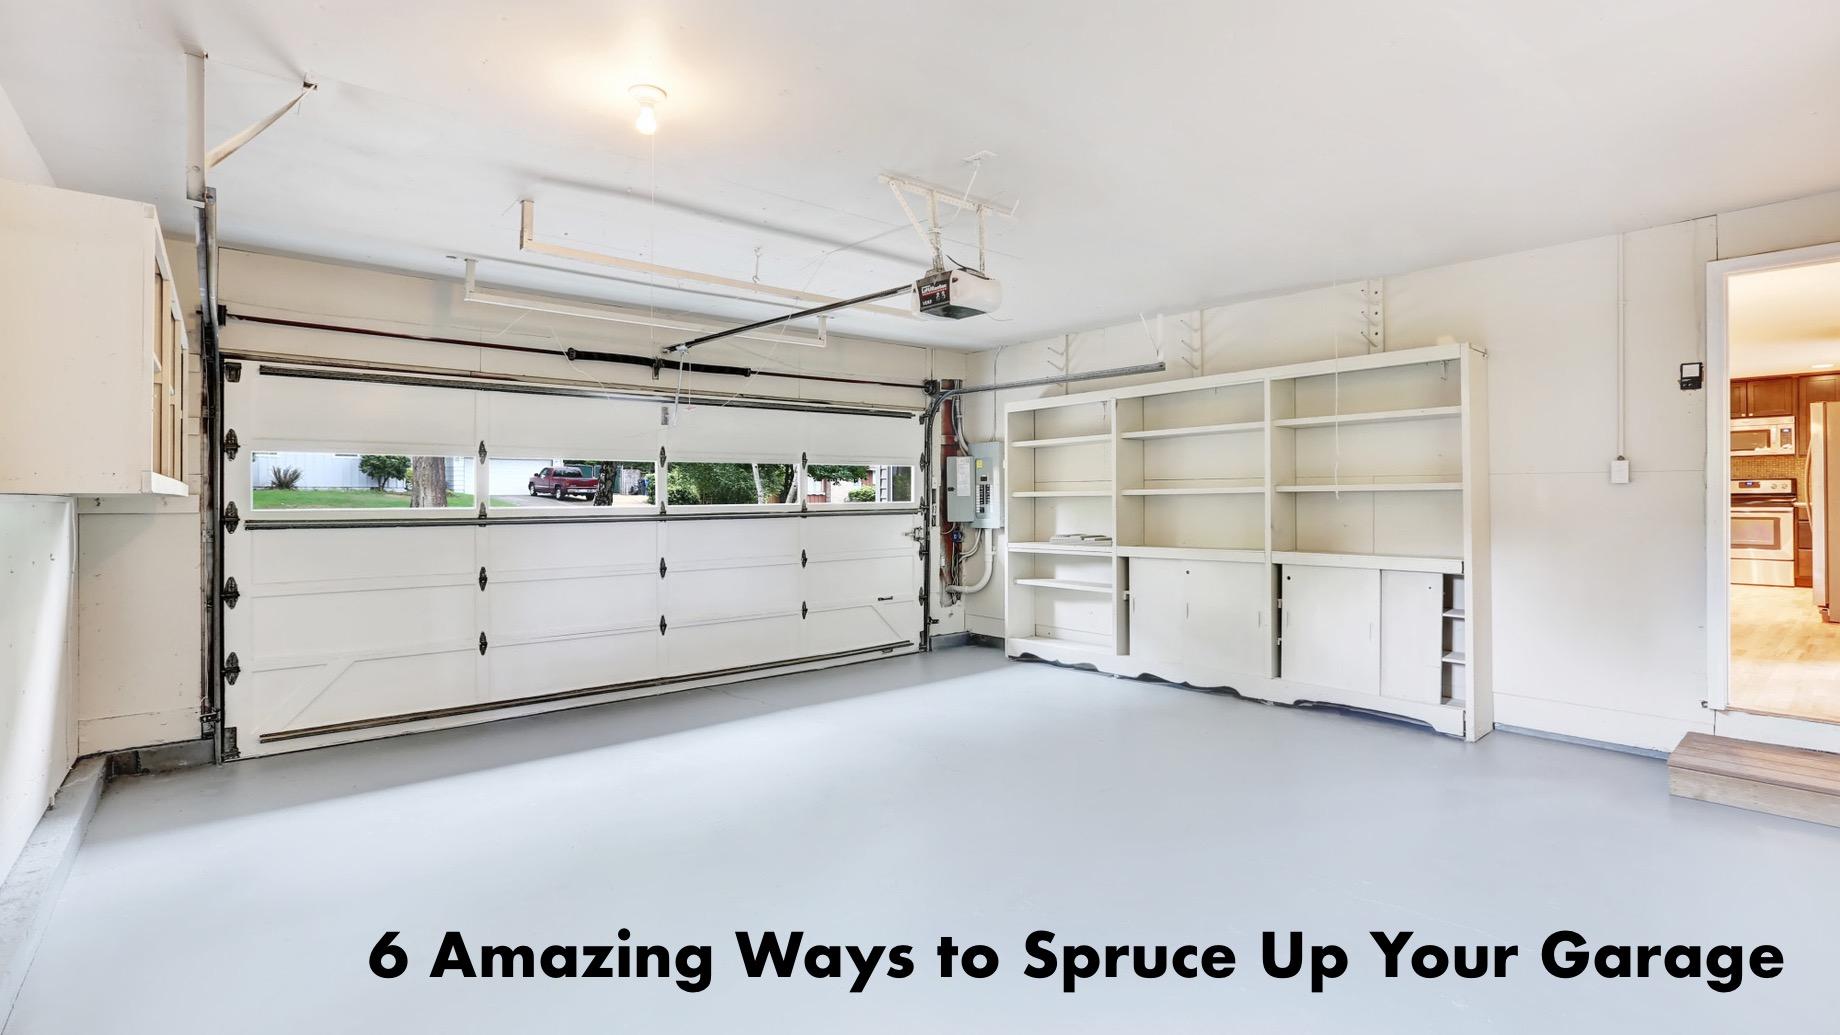 6 Amazing Ways to Spruce Up Your Garage